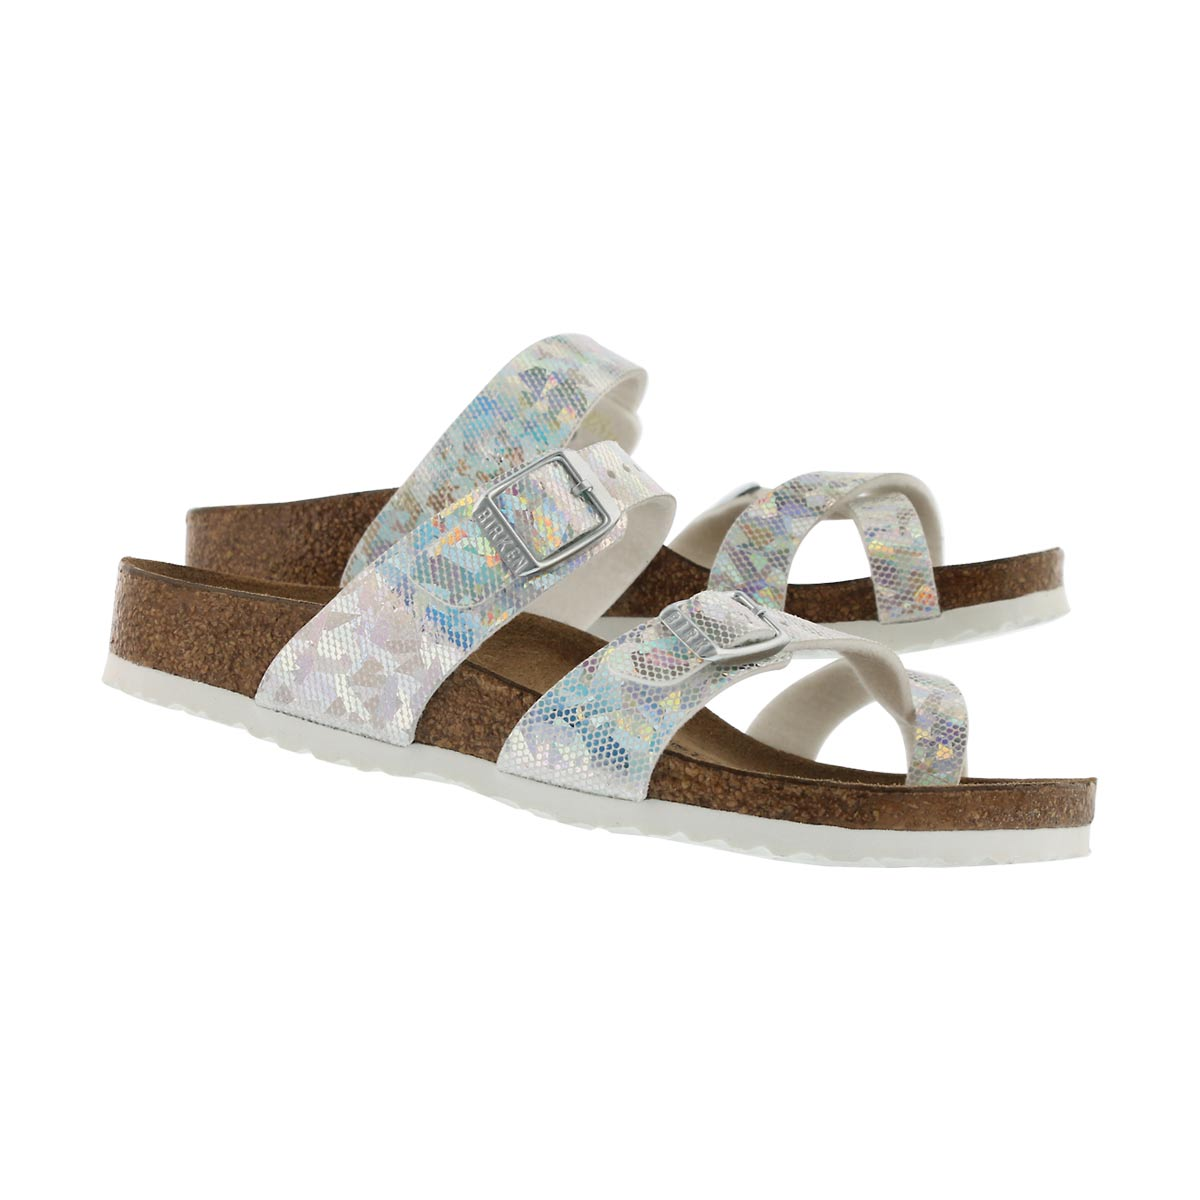 Girls' MAYARI BF hologram silver sandals